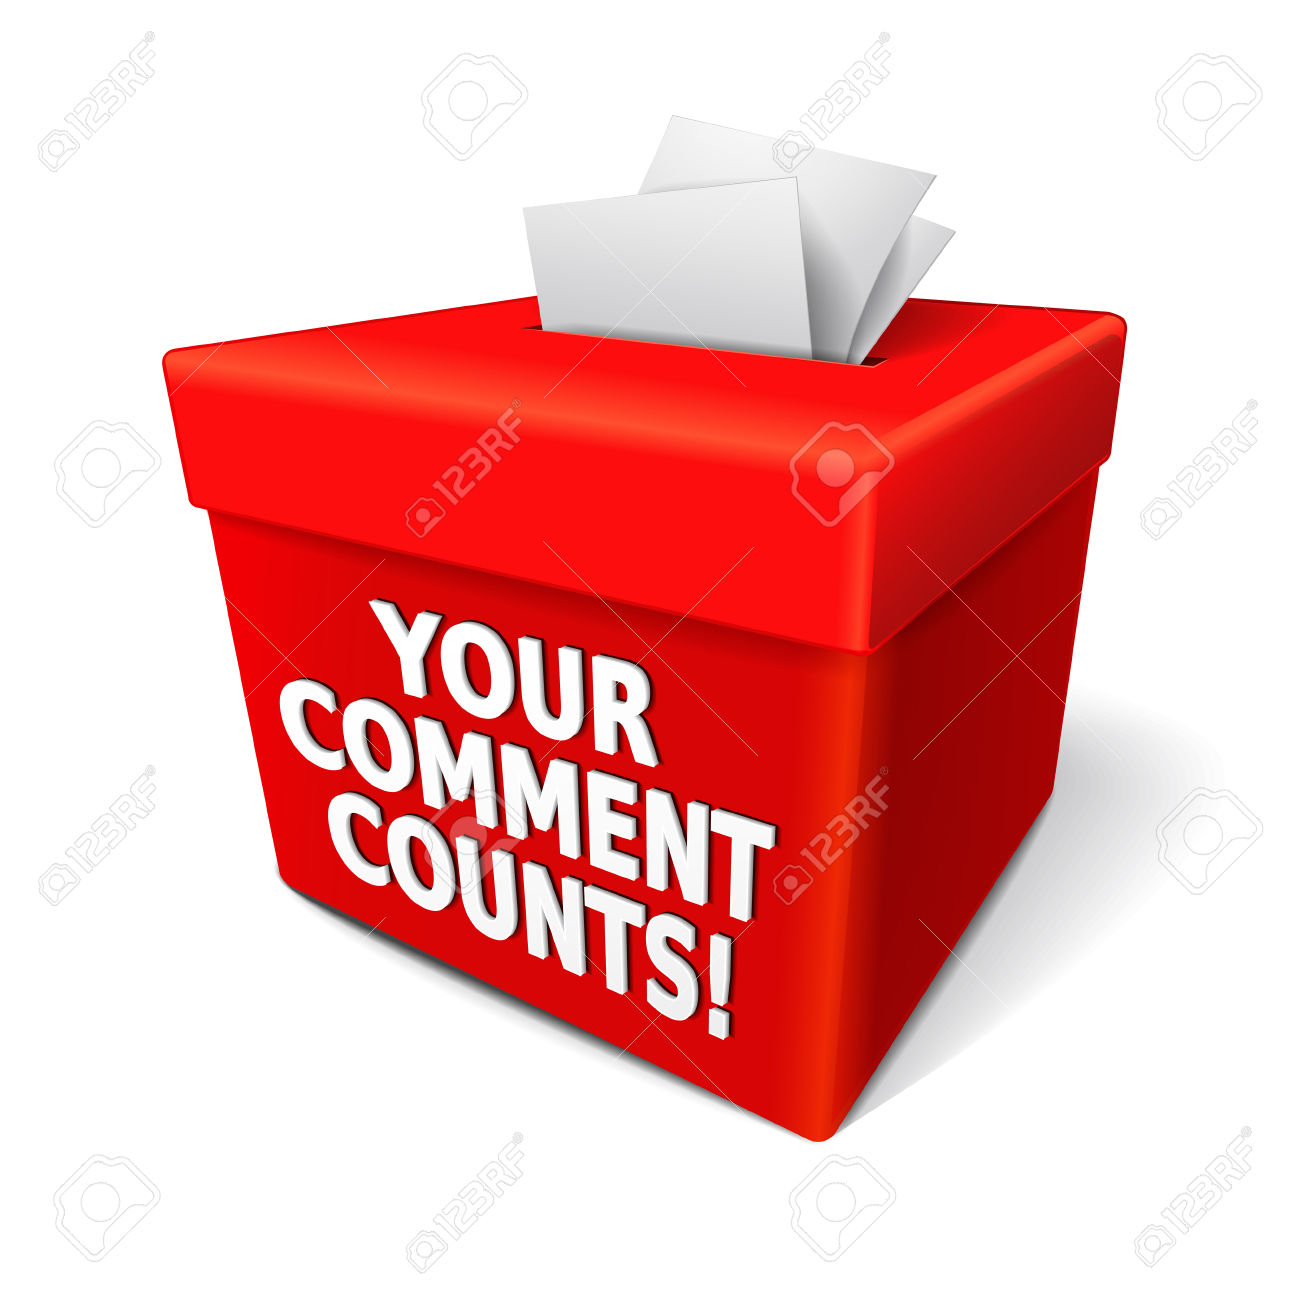 Your comment counts!